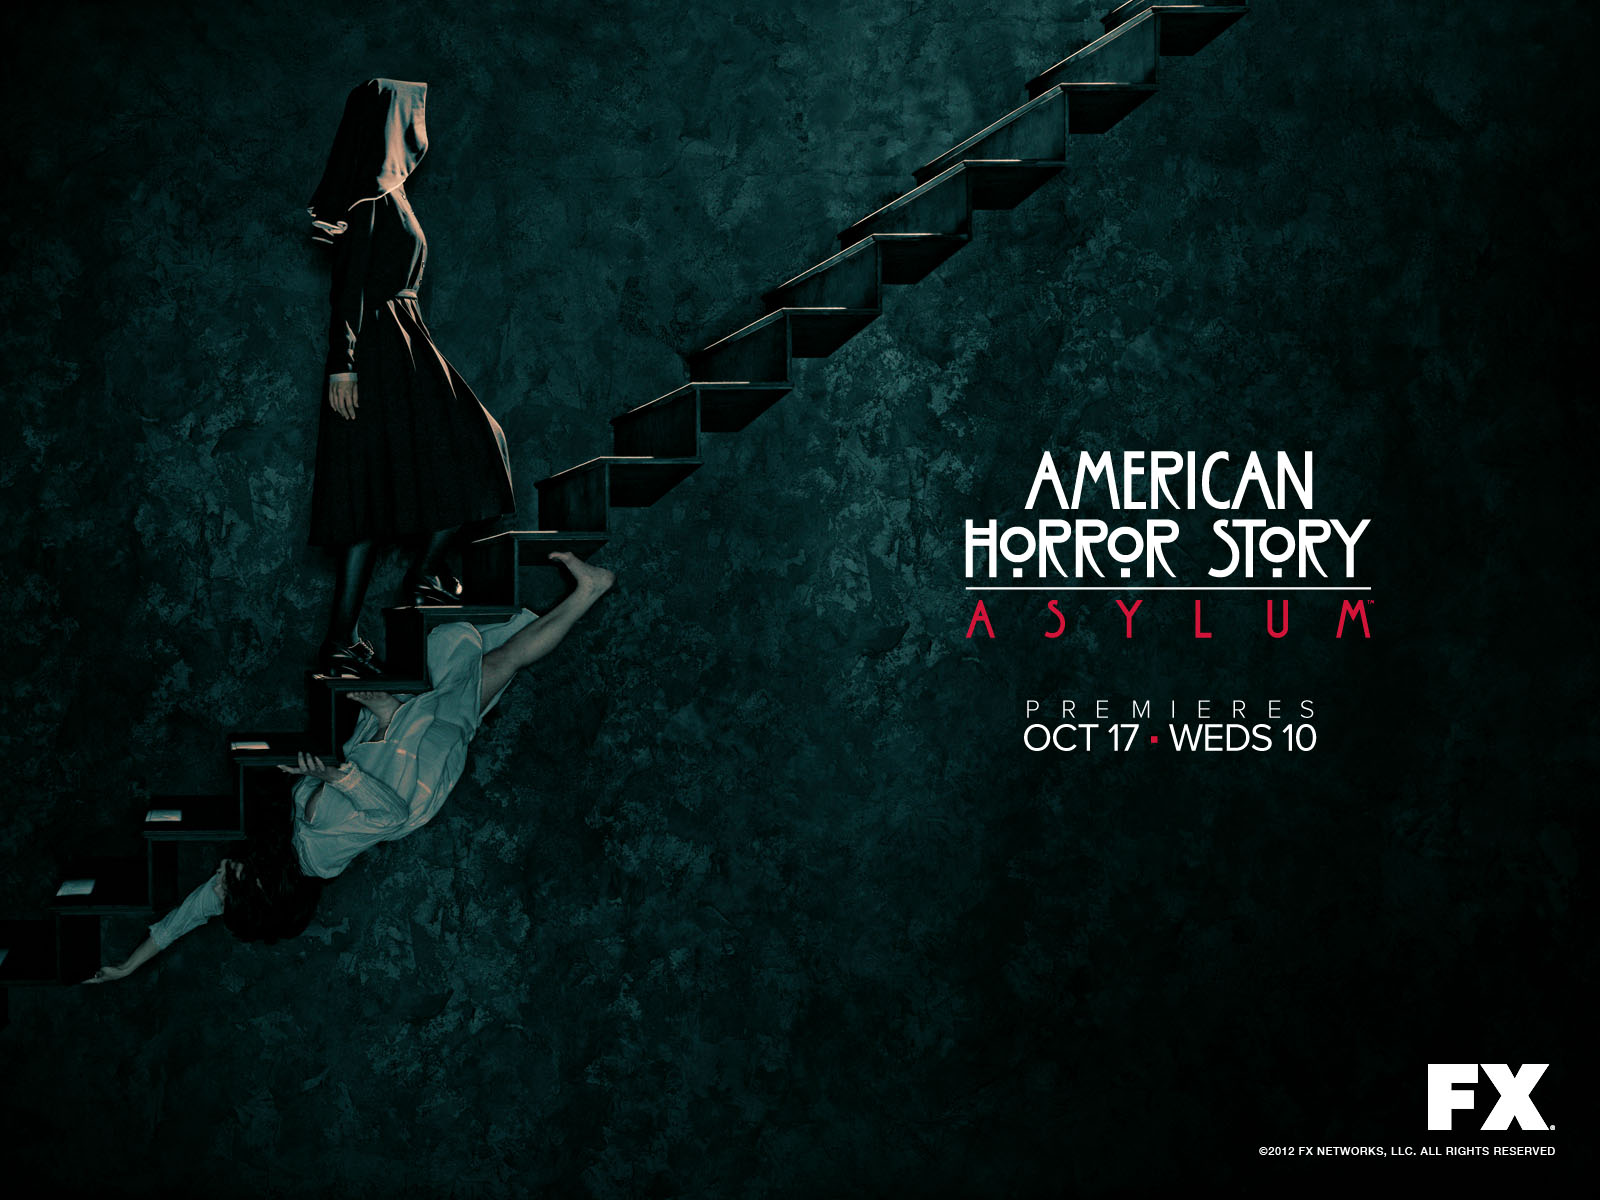 http://3.bp.blogspot.com/-IjxJLaHnuYU/UVUAOWkktEI/AAAAAAAAAJk/WQfB8bVWmlc/s1600/American-Horror-Story.jpg